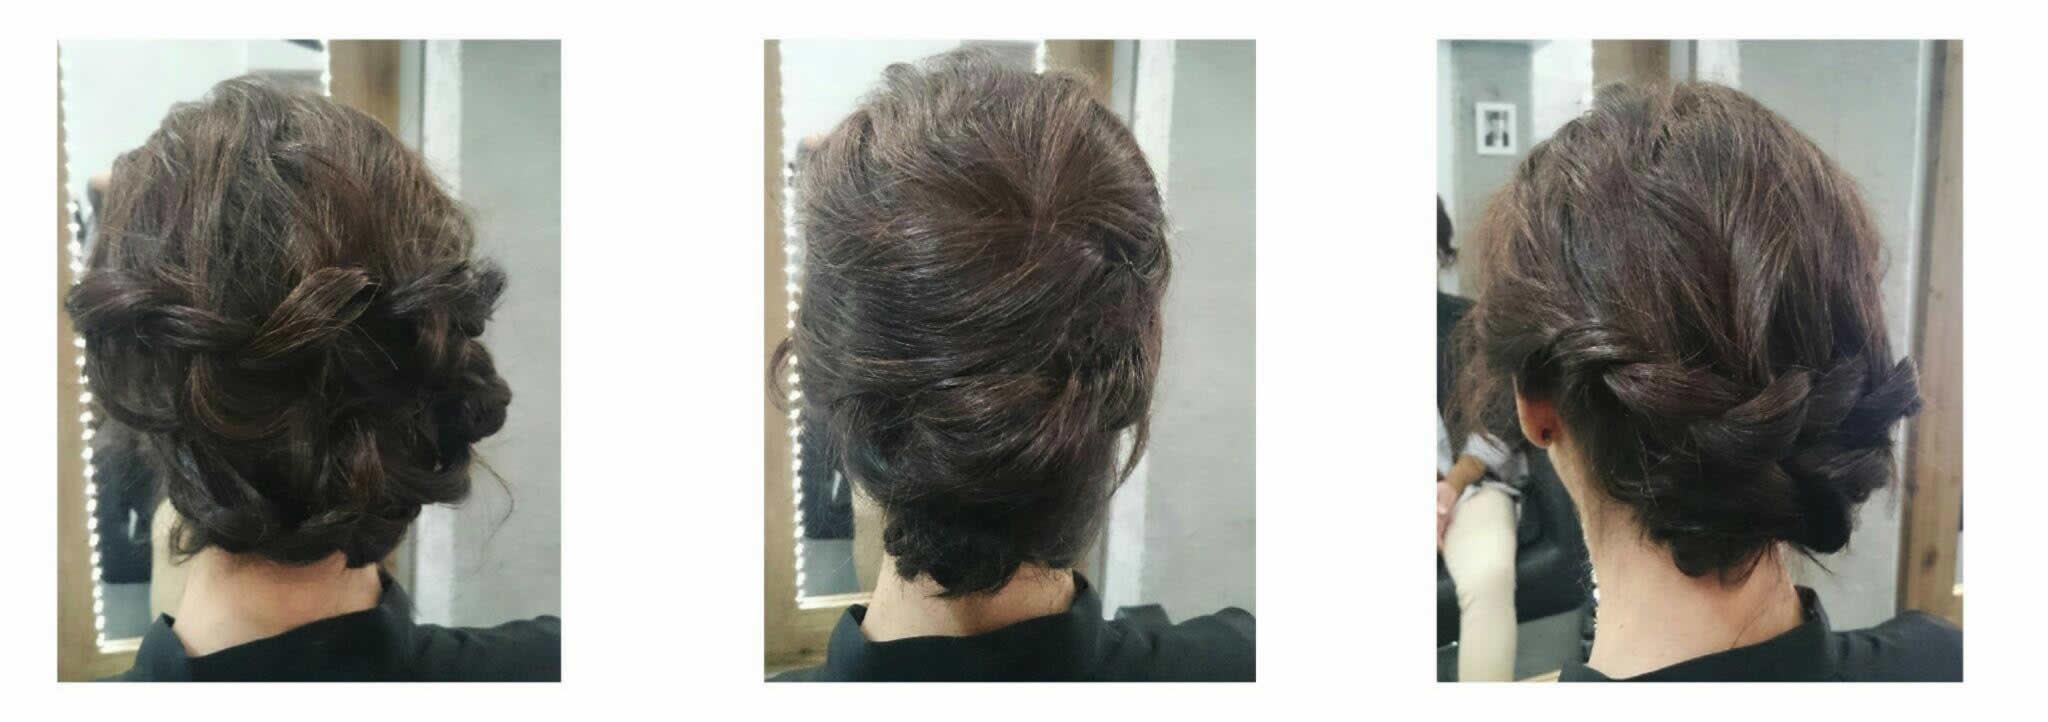 prueba de peinado novia bilbao